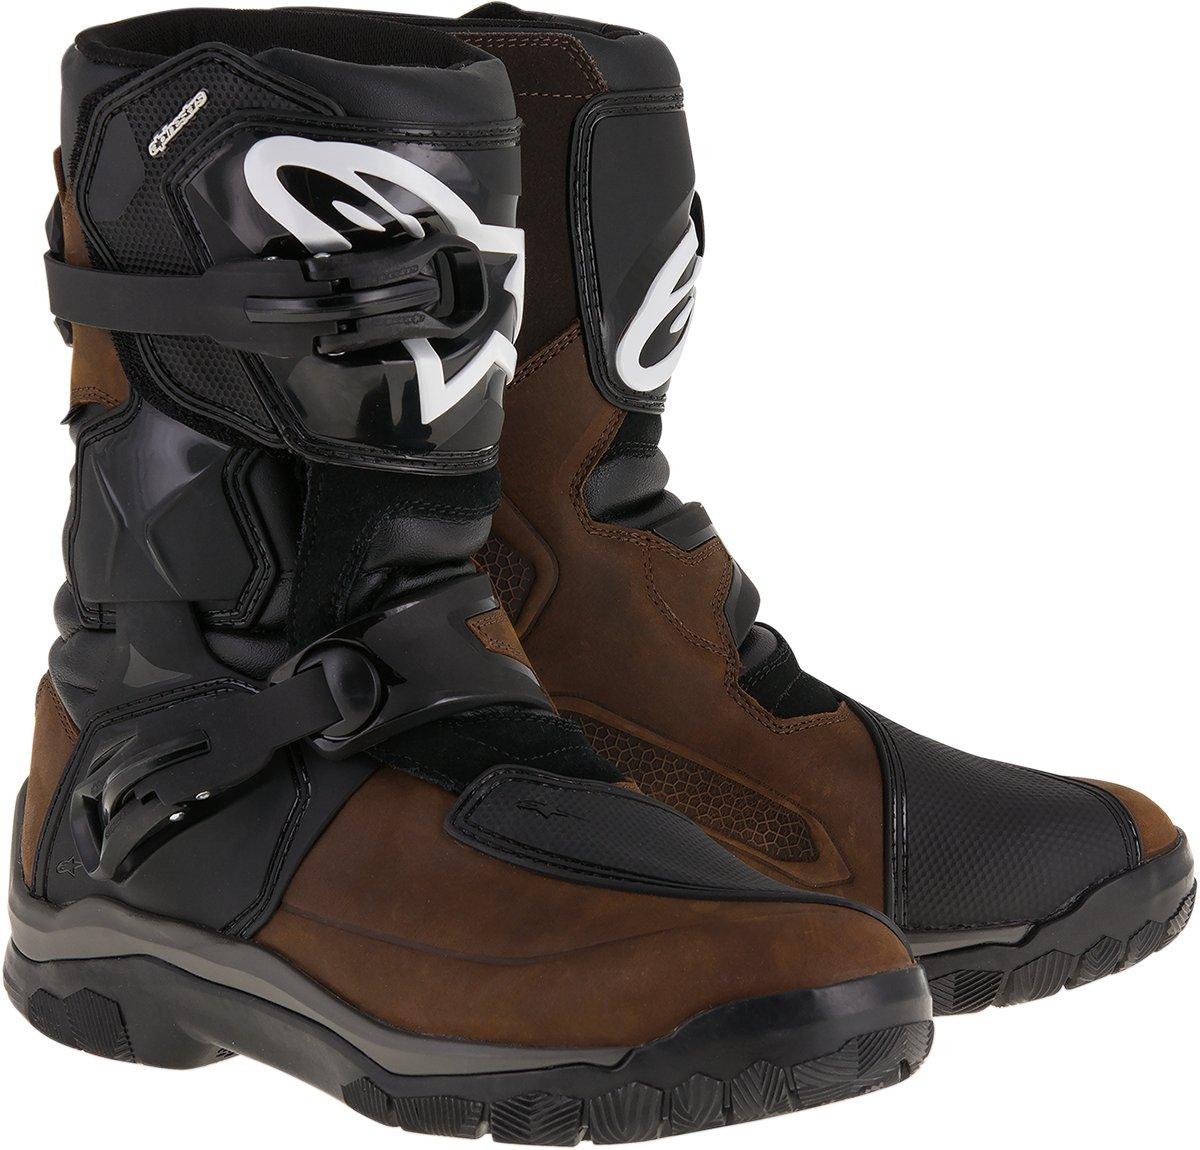 Alpinestars Mens Belize Drystar Oiled Leather Boot (Brown, 12) by Alpinestars